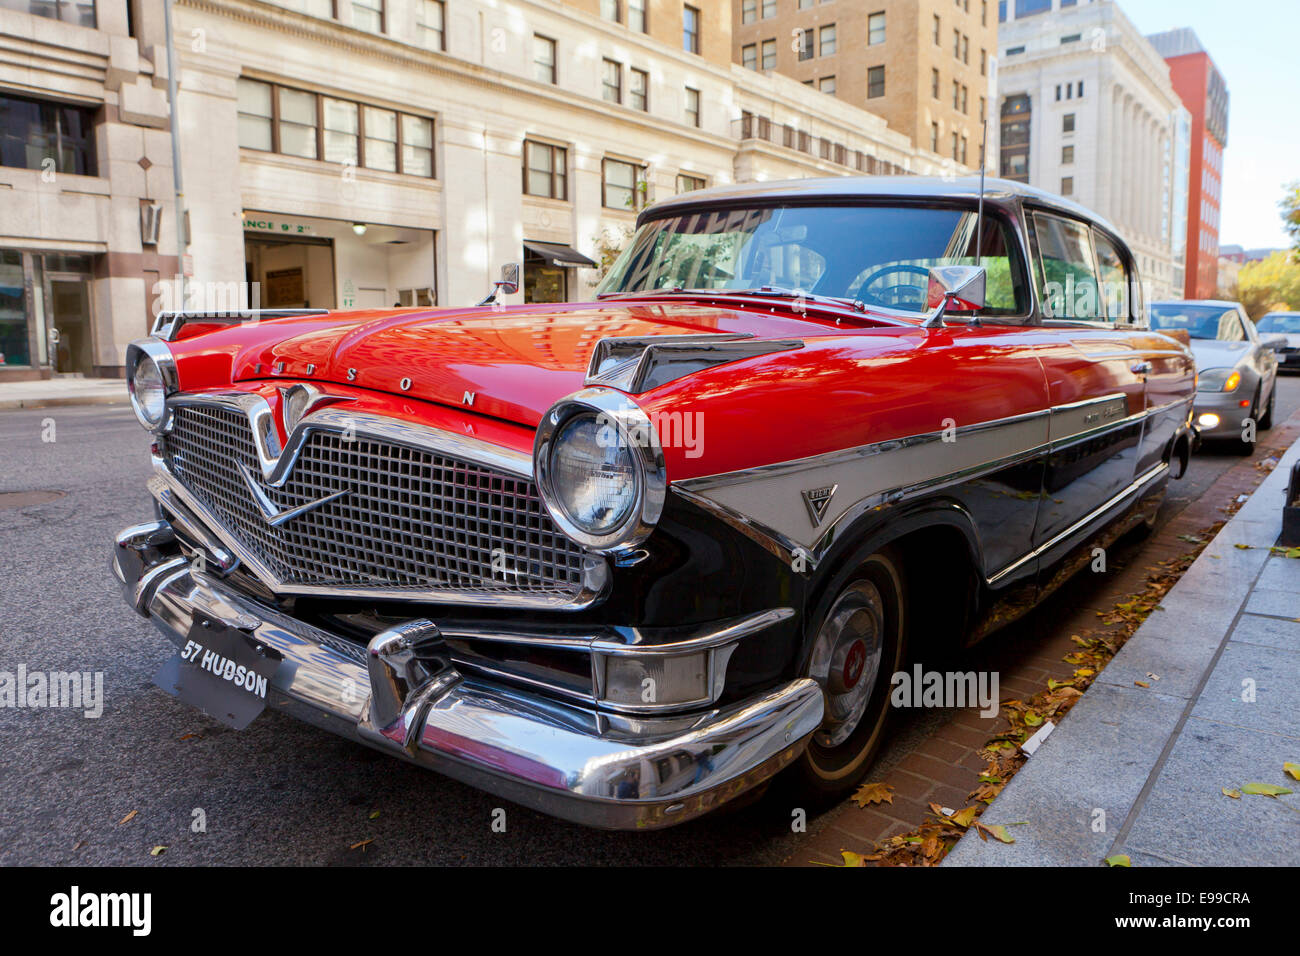 Vintage 1957 Hudson Hornet V8 Super Hollywood sedan - USA - Stock Image